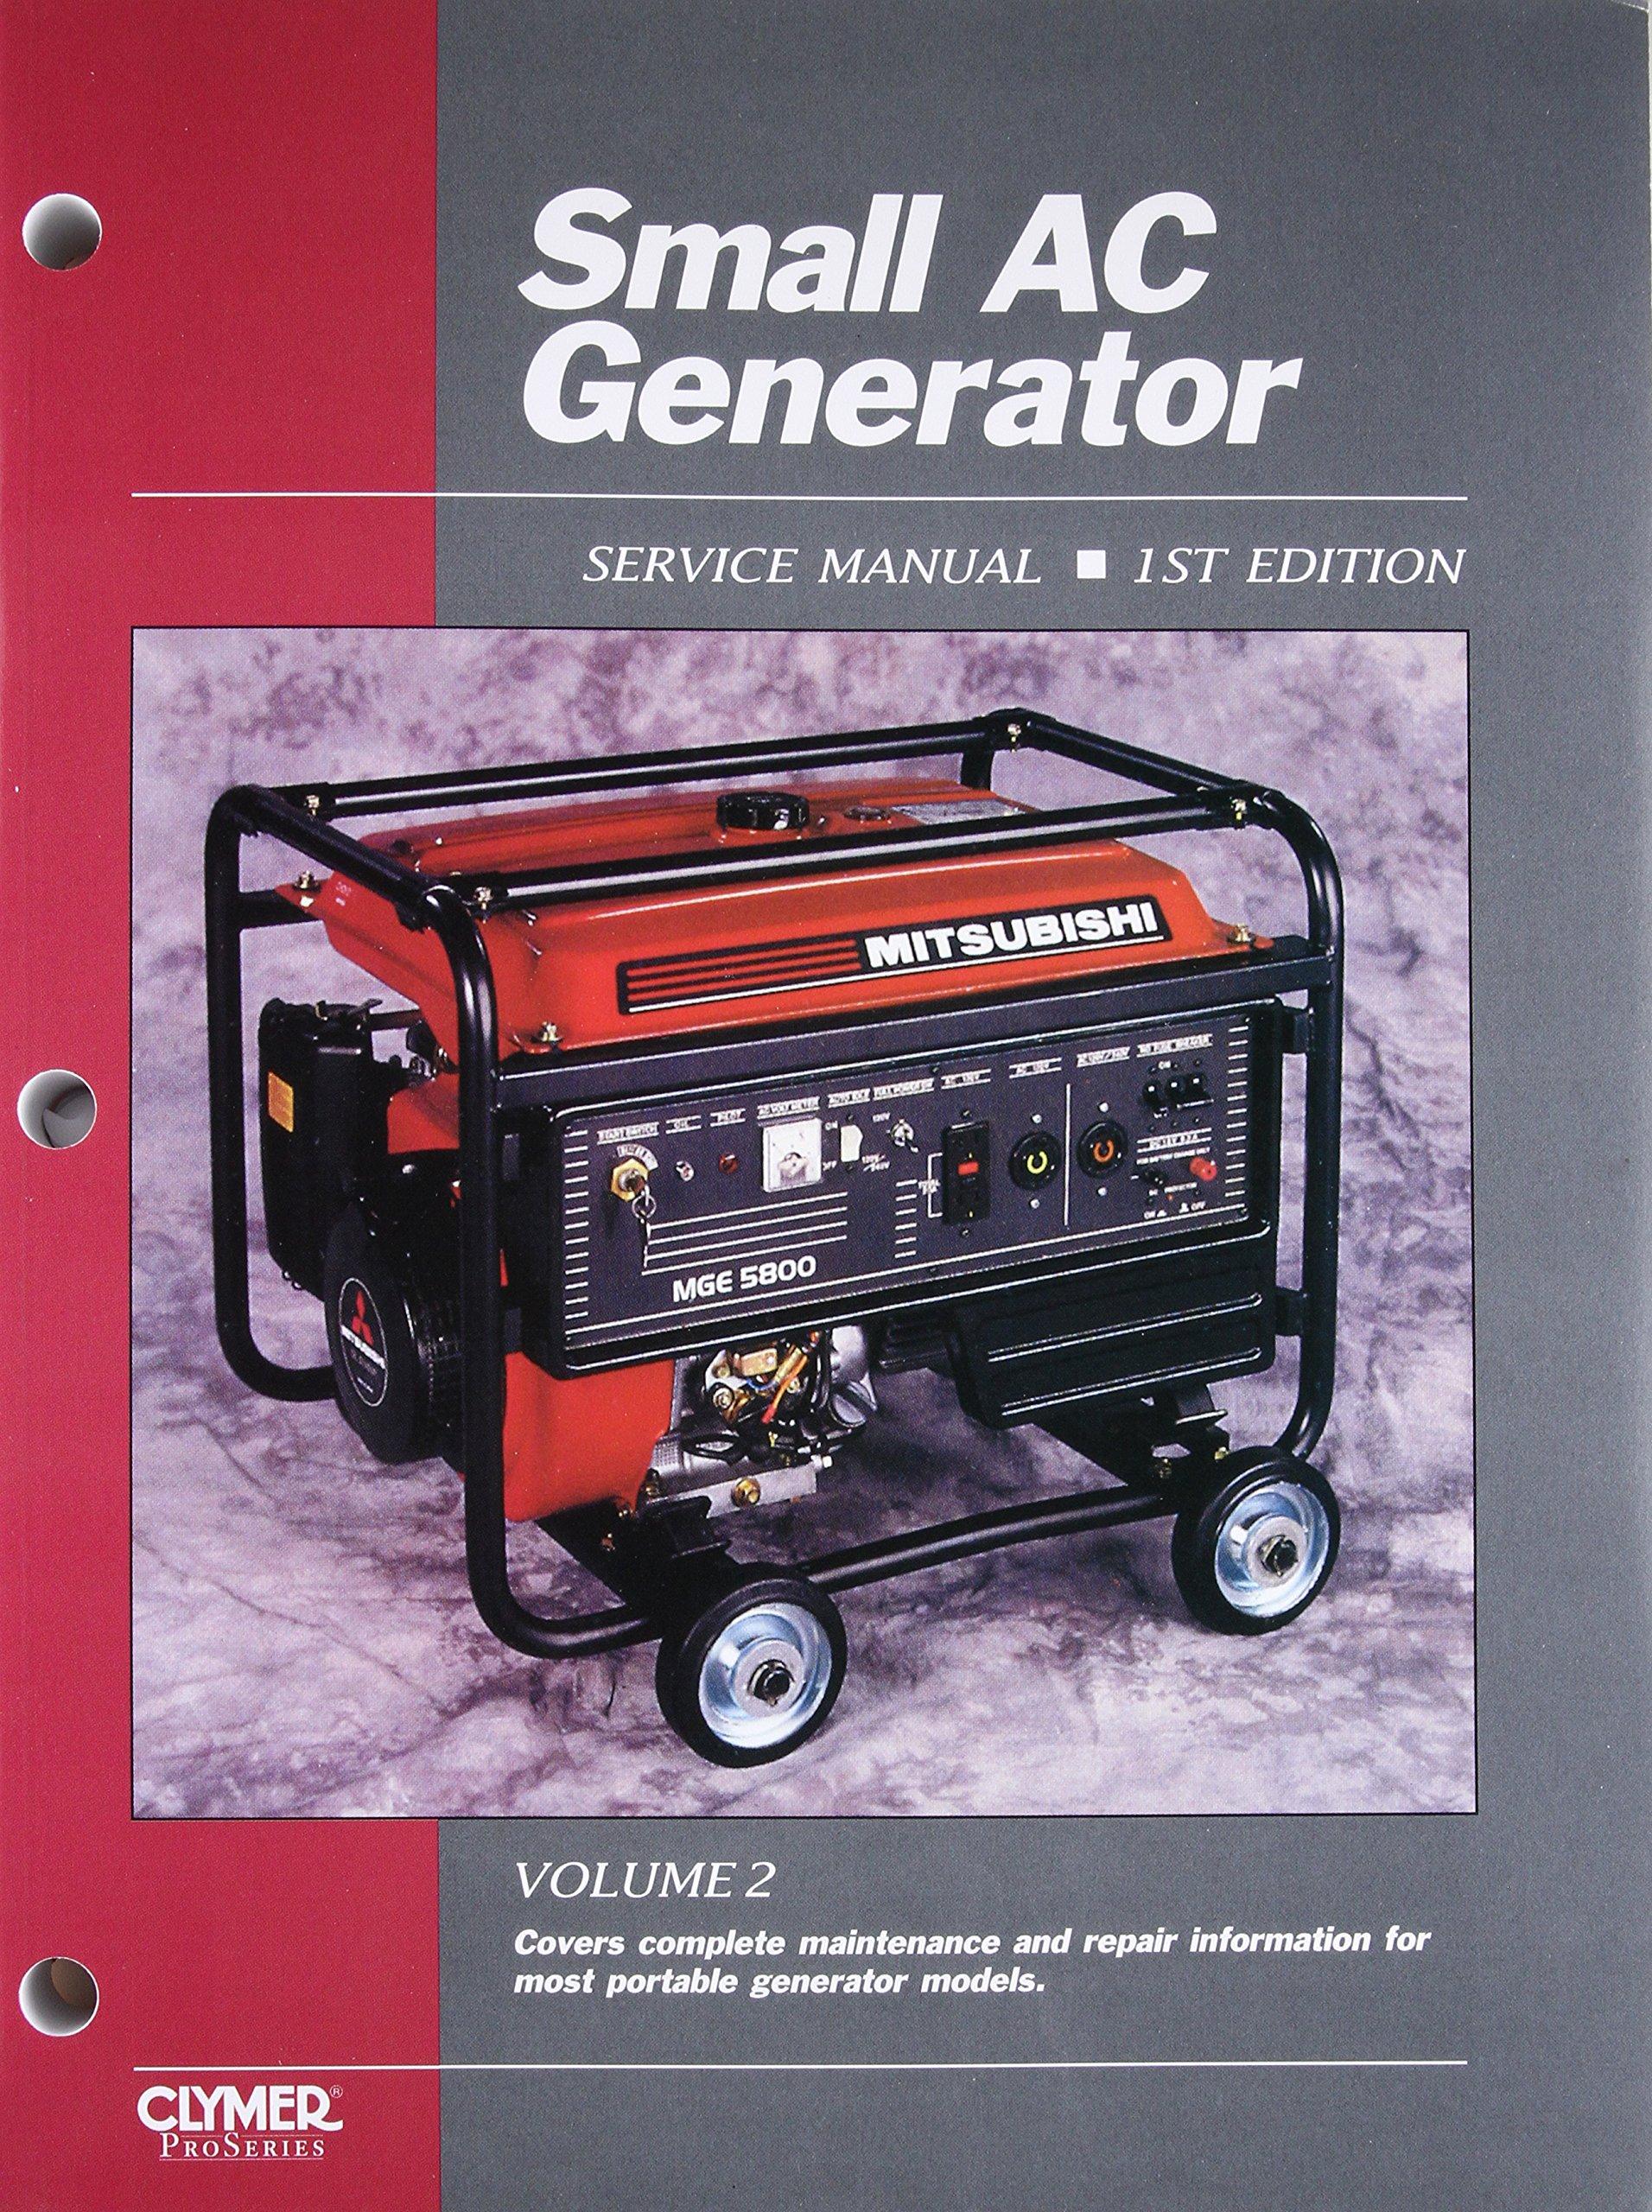 Small Ac Generator Service Volume: 2: Amazon.es: Penton ...